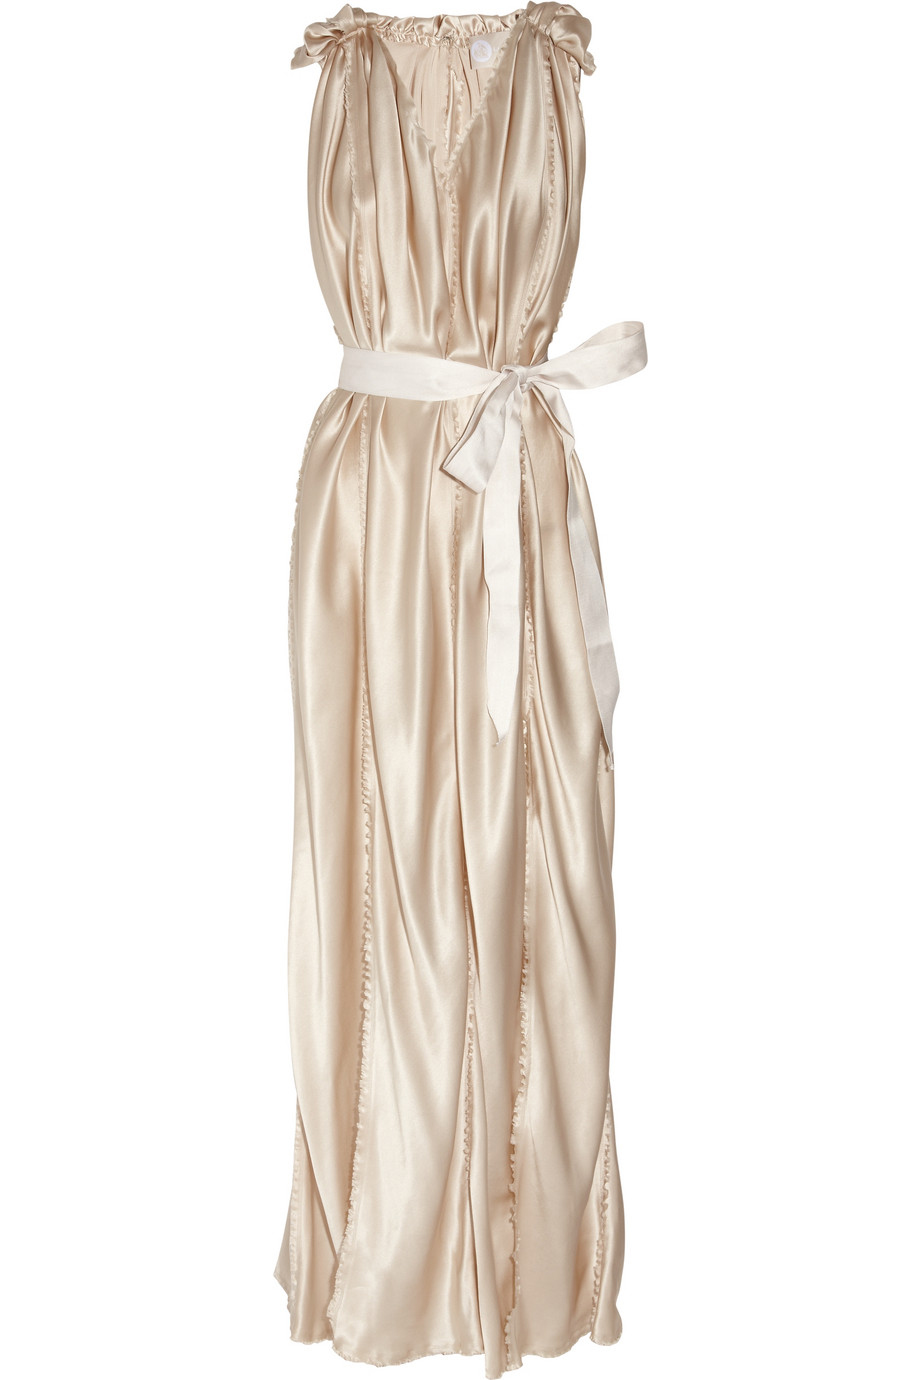 12 non-typical designer wedding dresses featuring Lanvin, Temperley ...